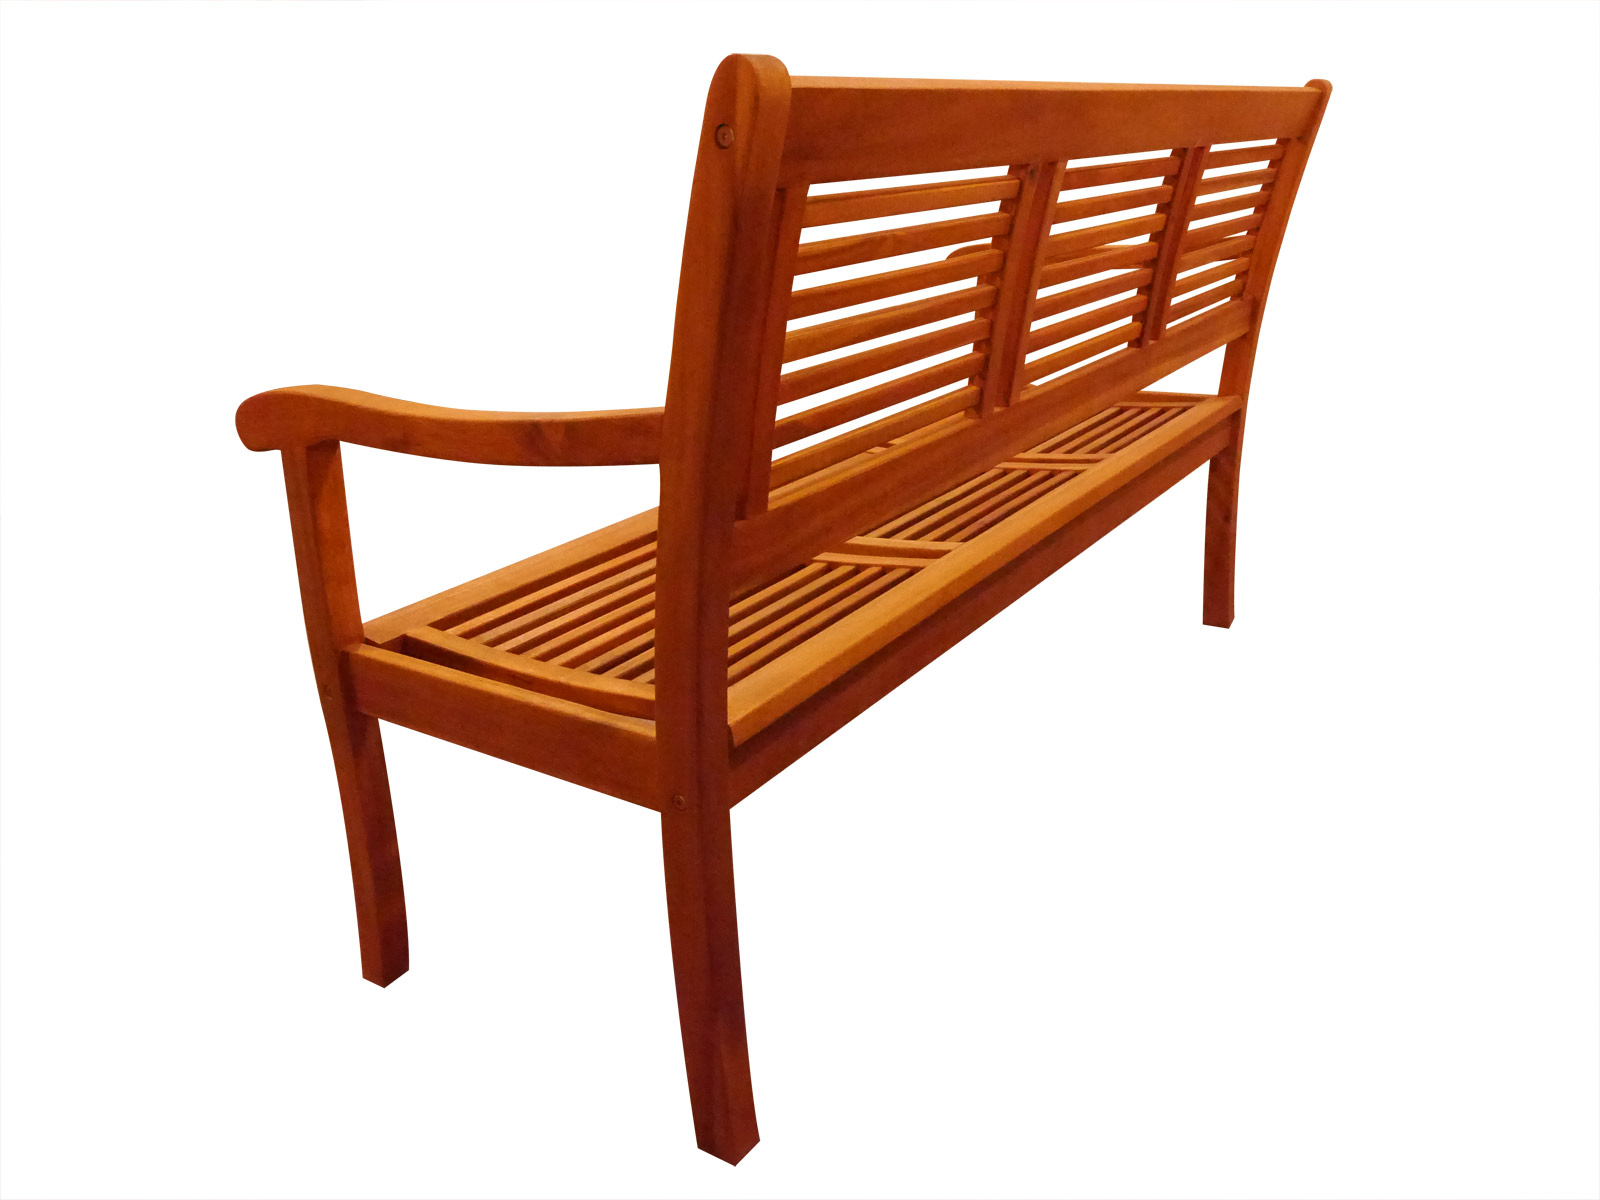 sam 3 sitzer gartenbank sitzbank 150 cm akazie cordoba. Black Bedroom Furniture Sets. Home Design Ideas